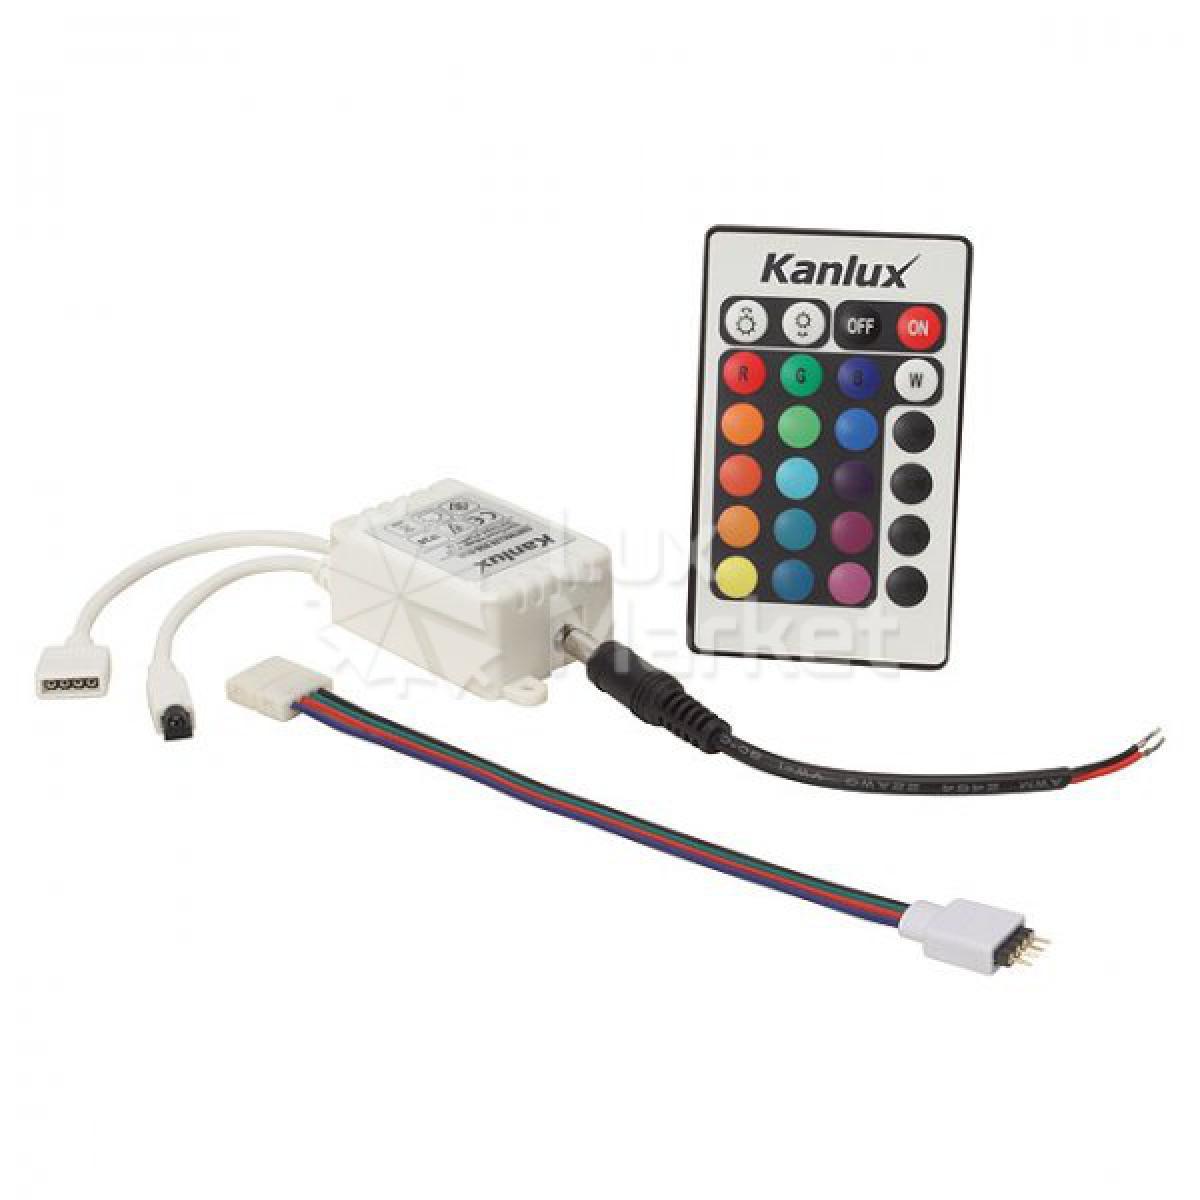 diody RGB, oświetlenie LED RGB, system LED RGB, LED RGB